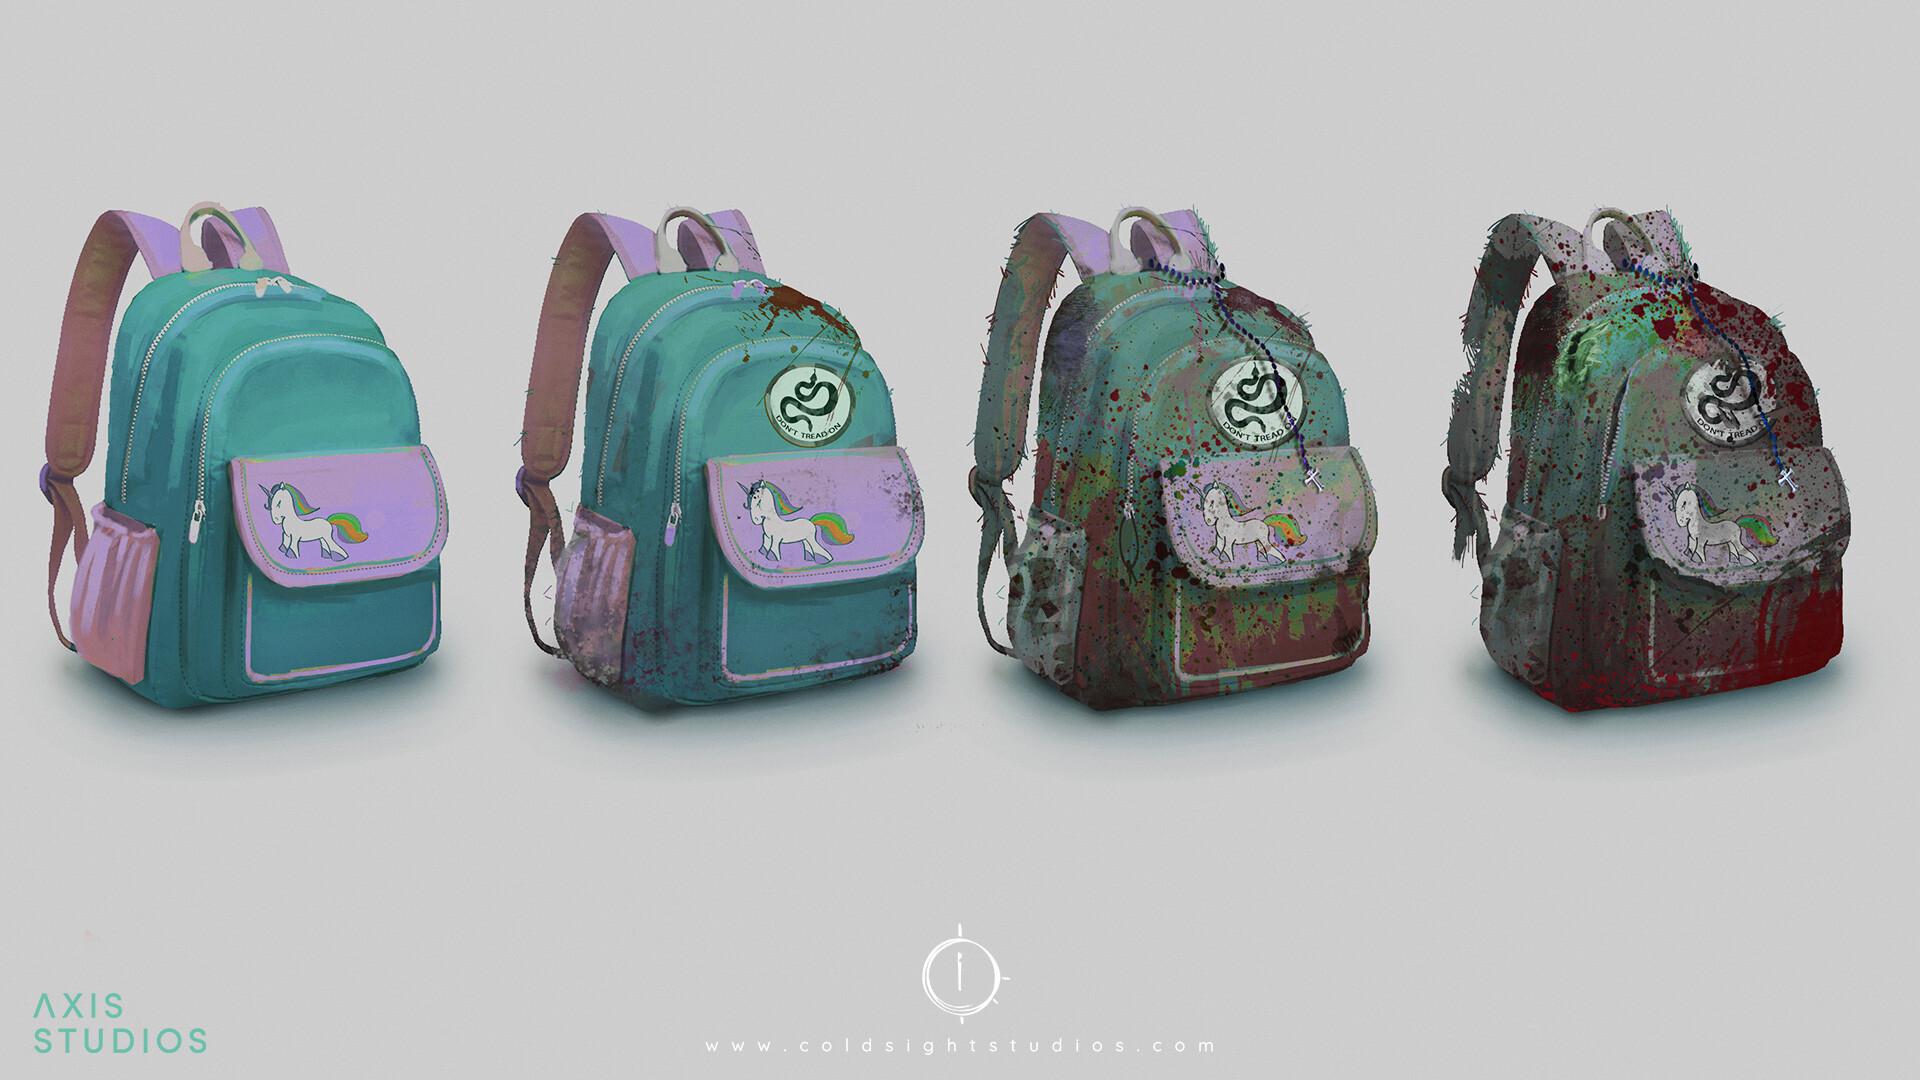 Alessandro chirico nola conceptart backpack v013